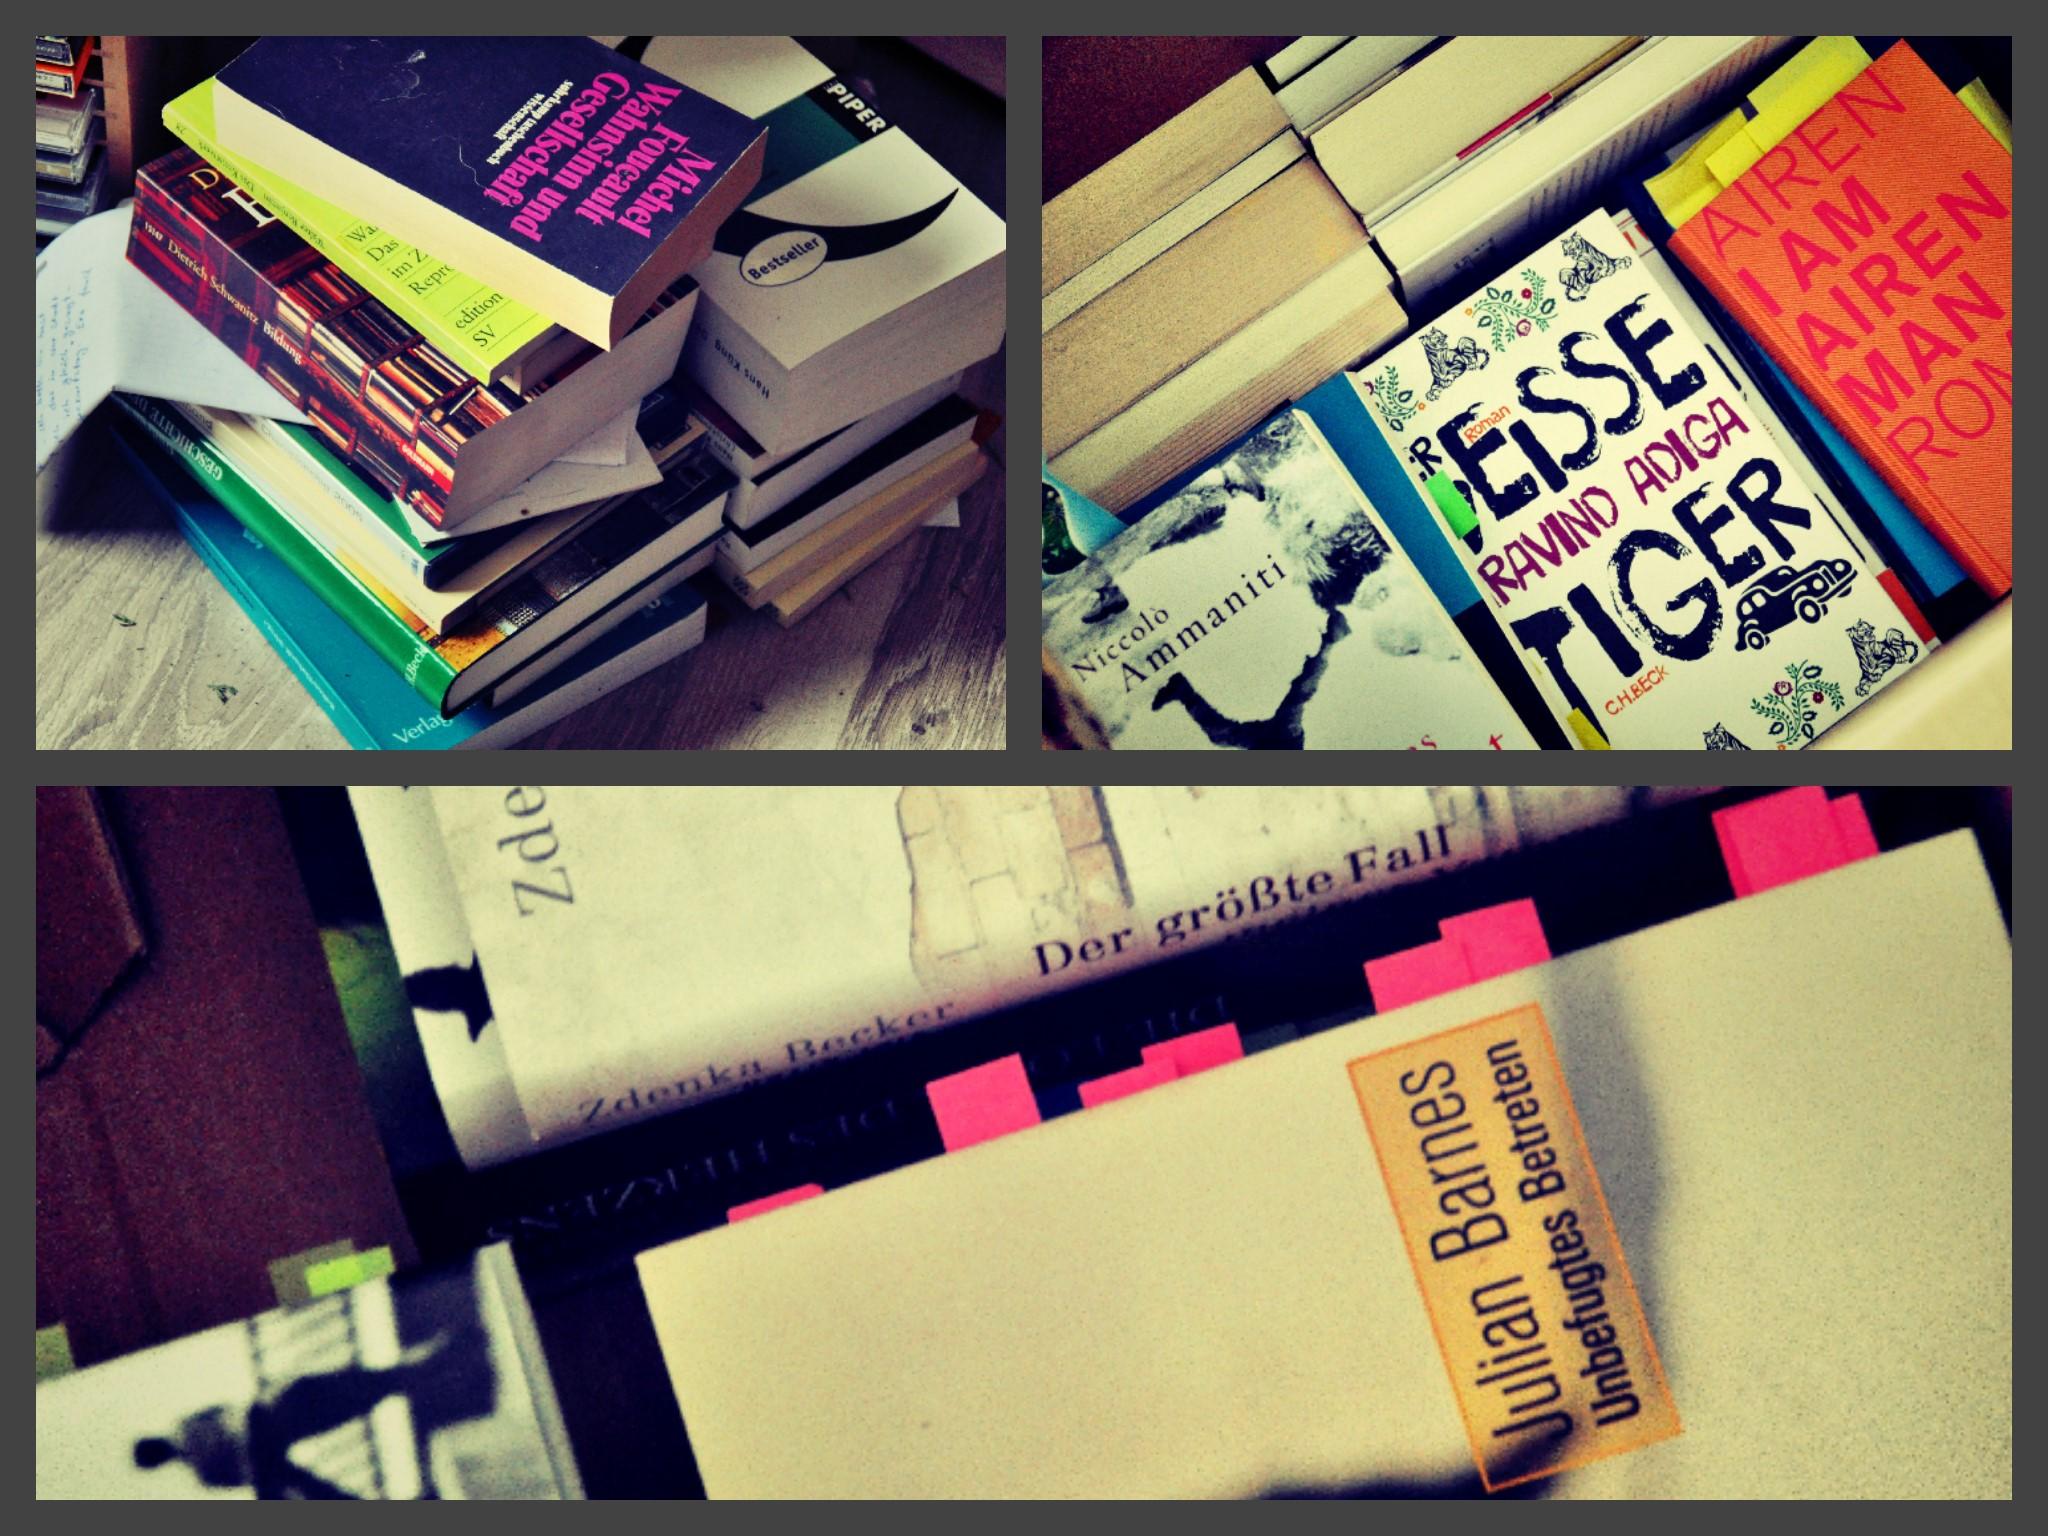 Bibliothek Collage1